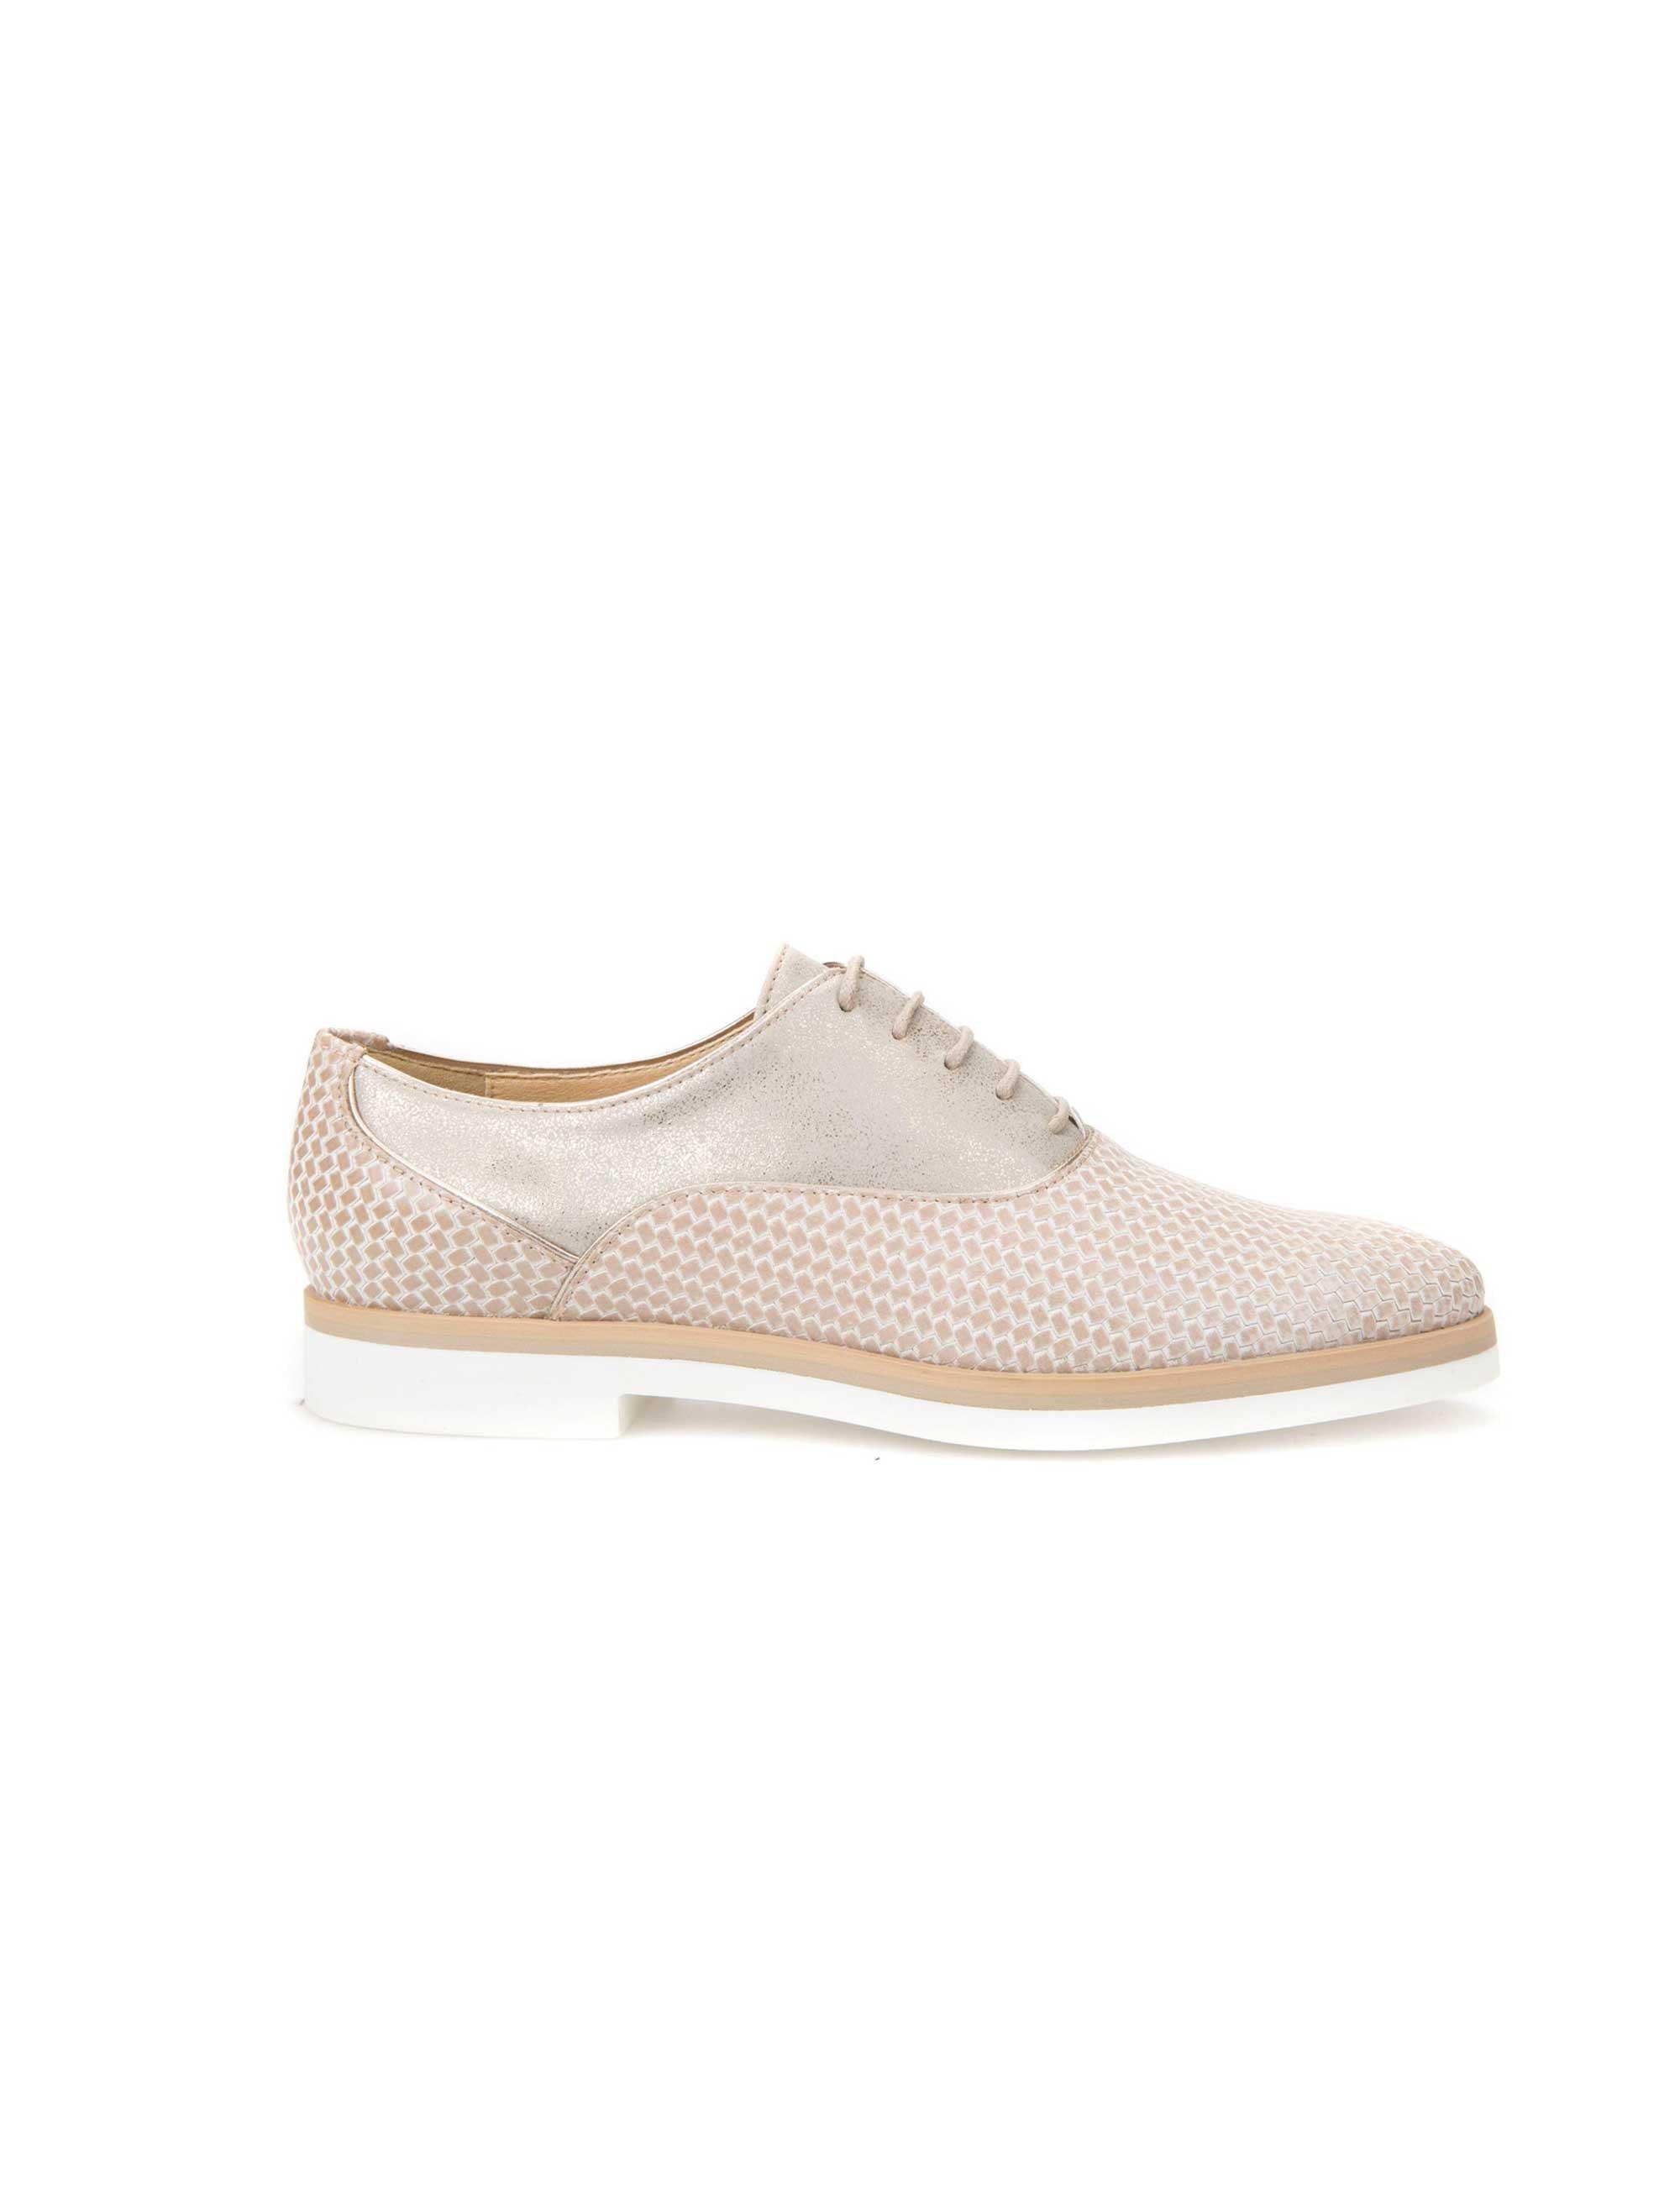 کفش چرم تخت زنانه JANALEE - جی اوکس